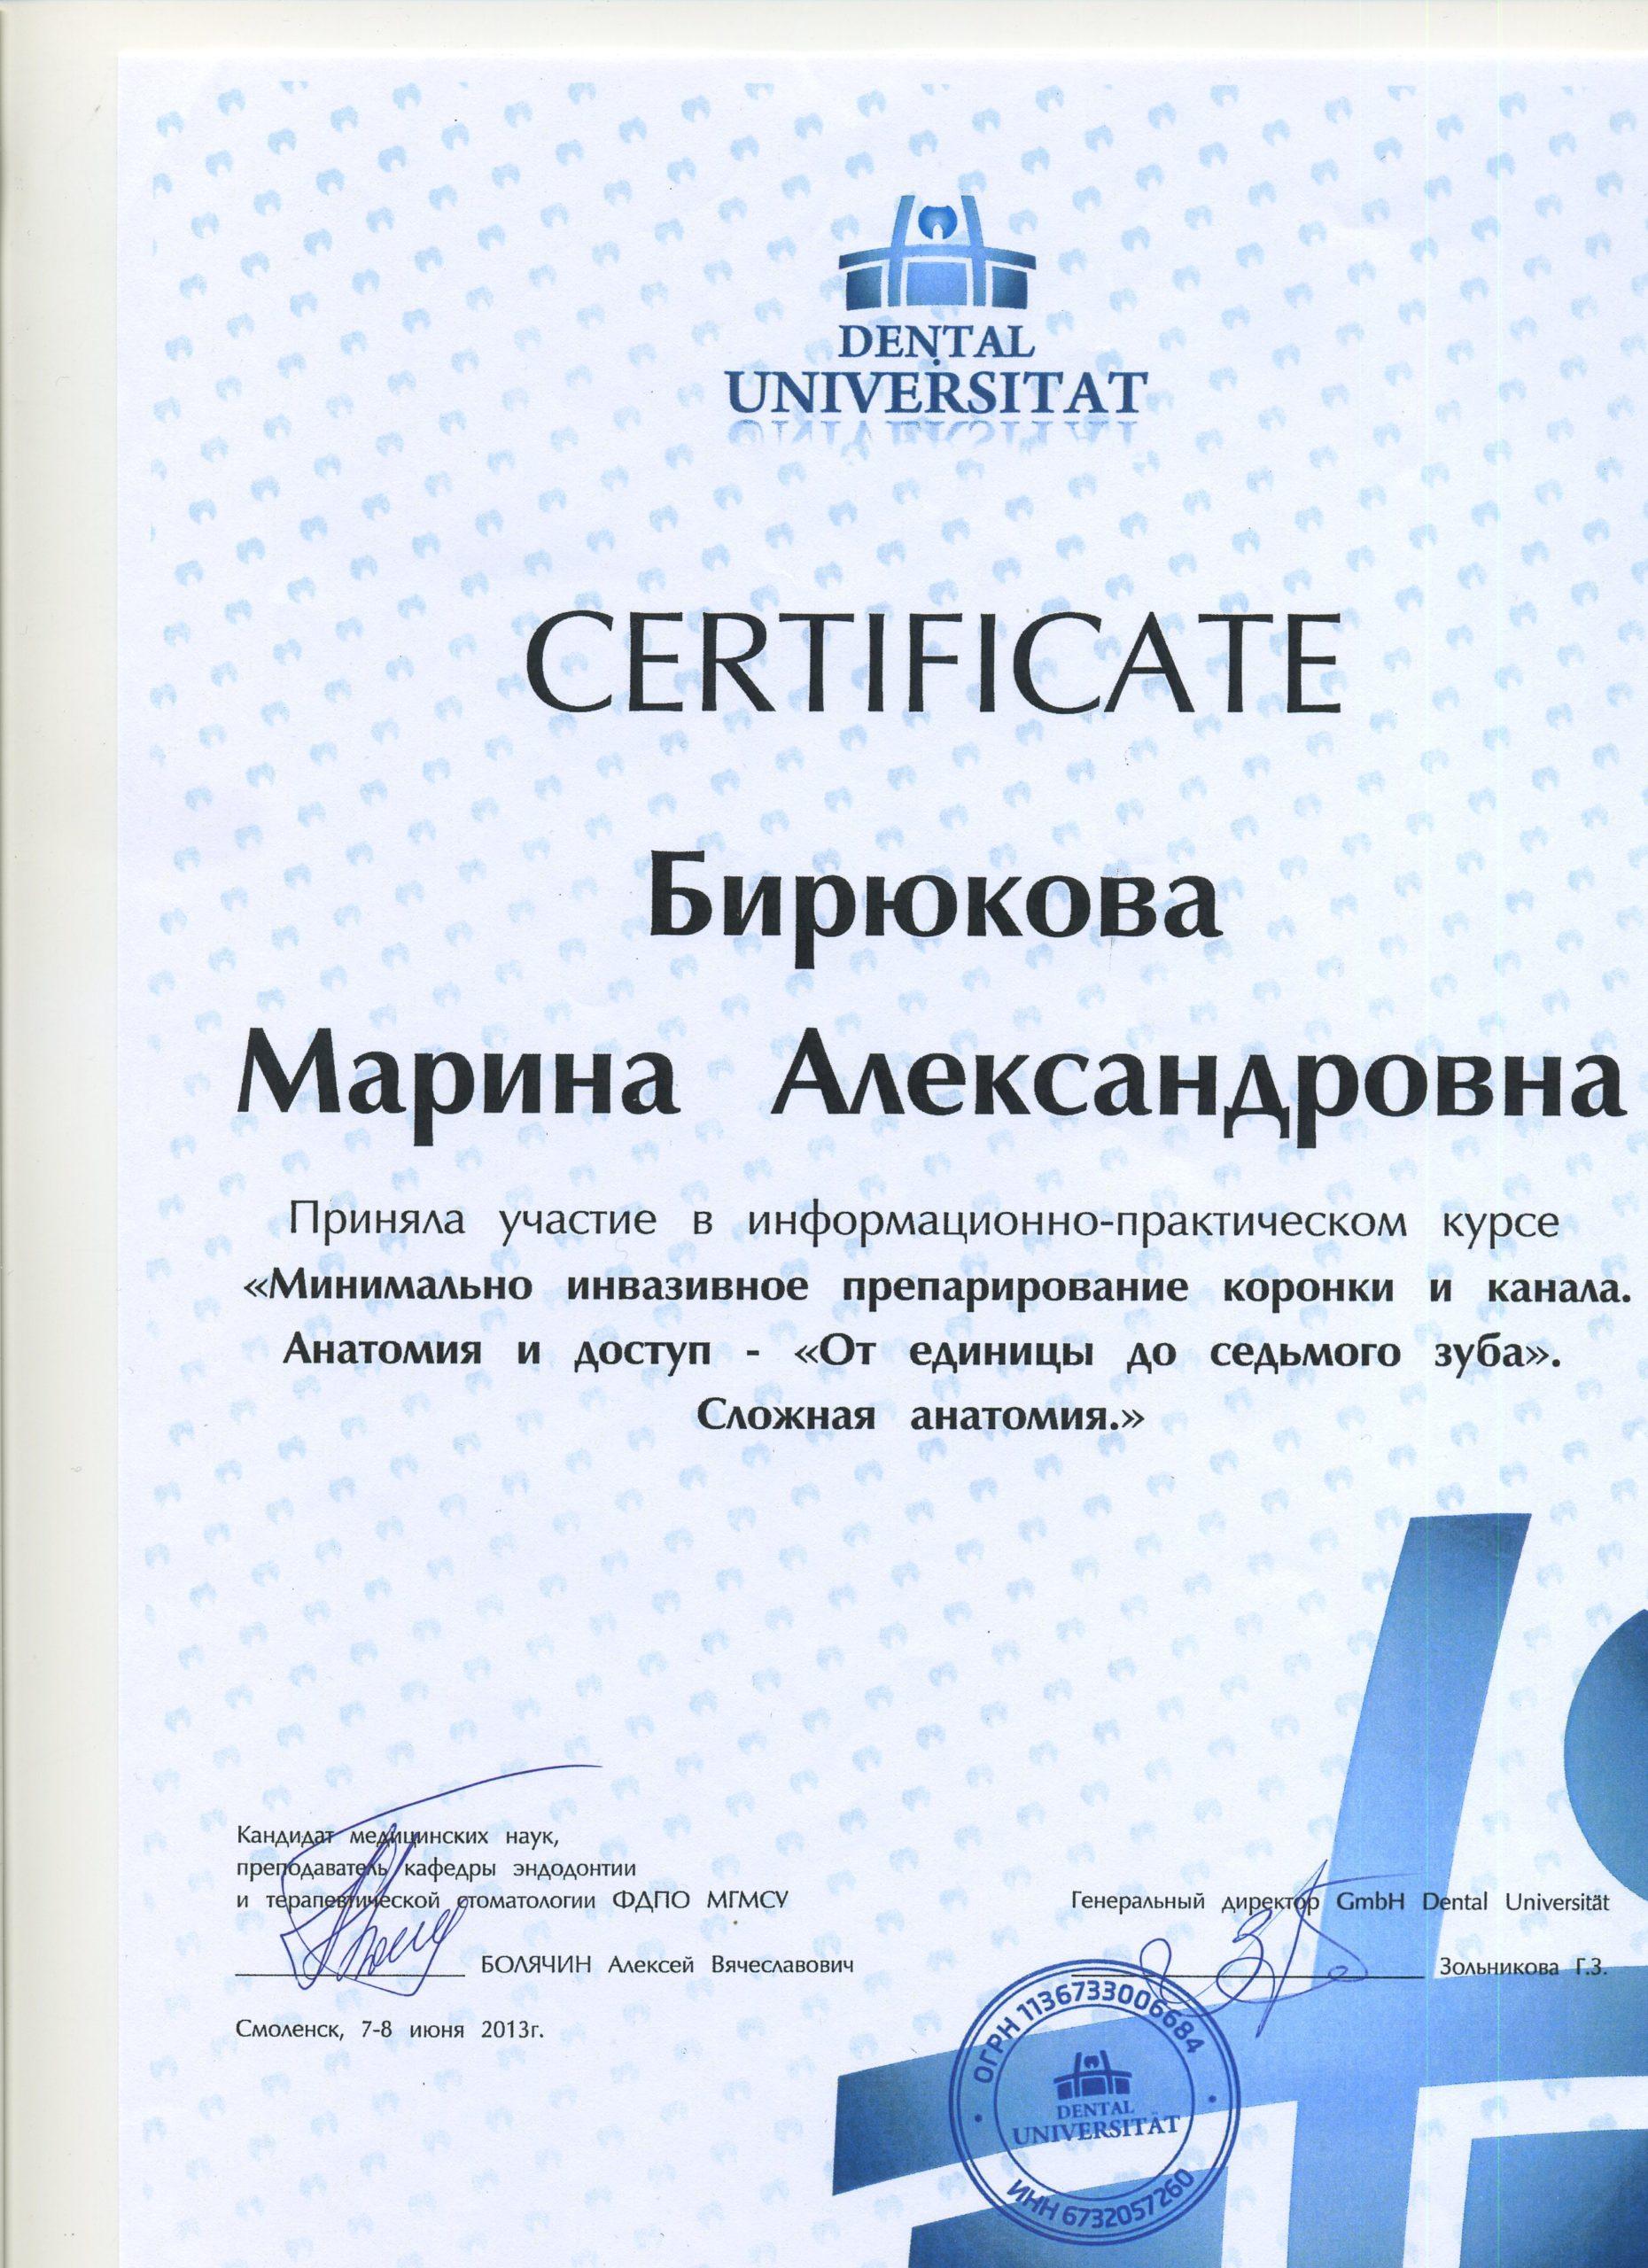 Сертифиат Жилеткова Марина Александровна_15